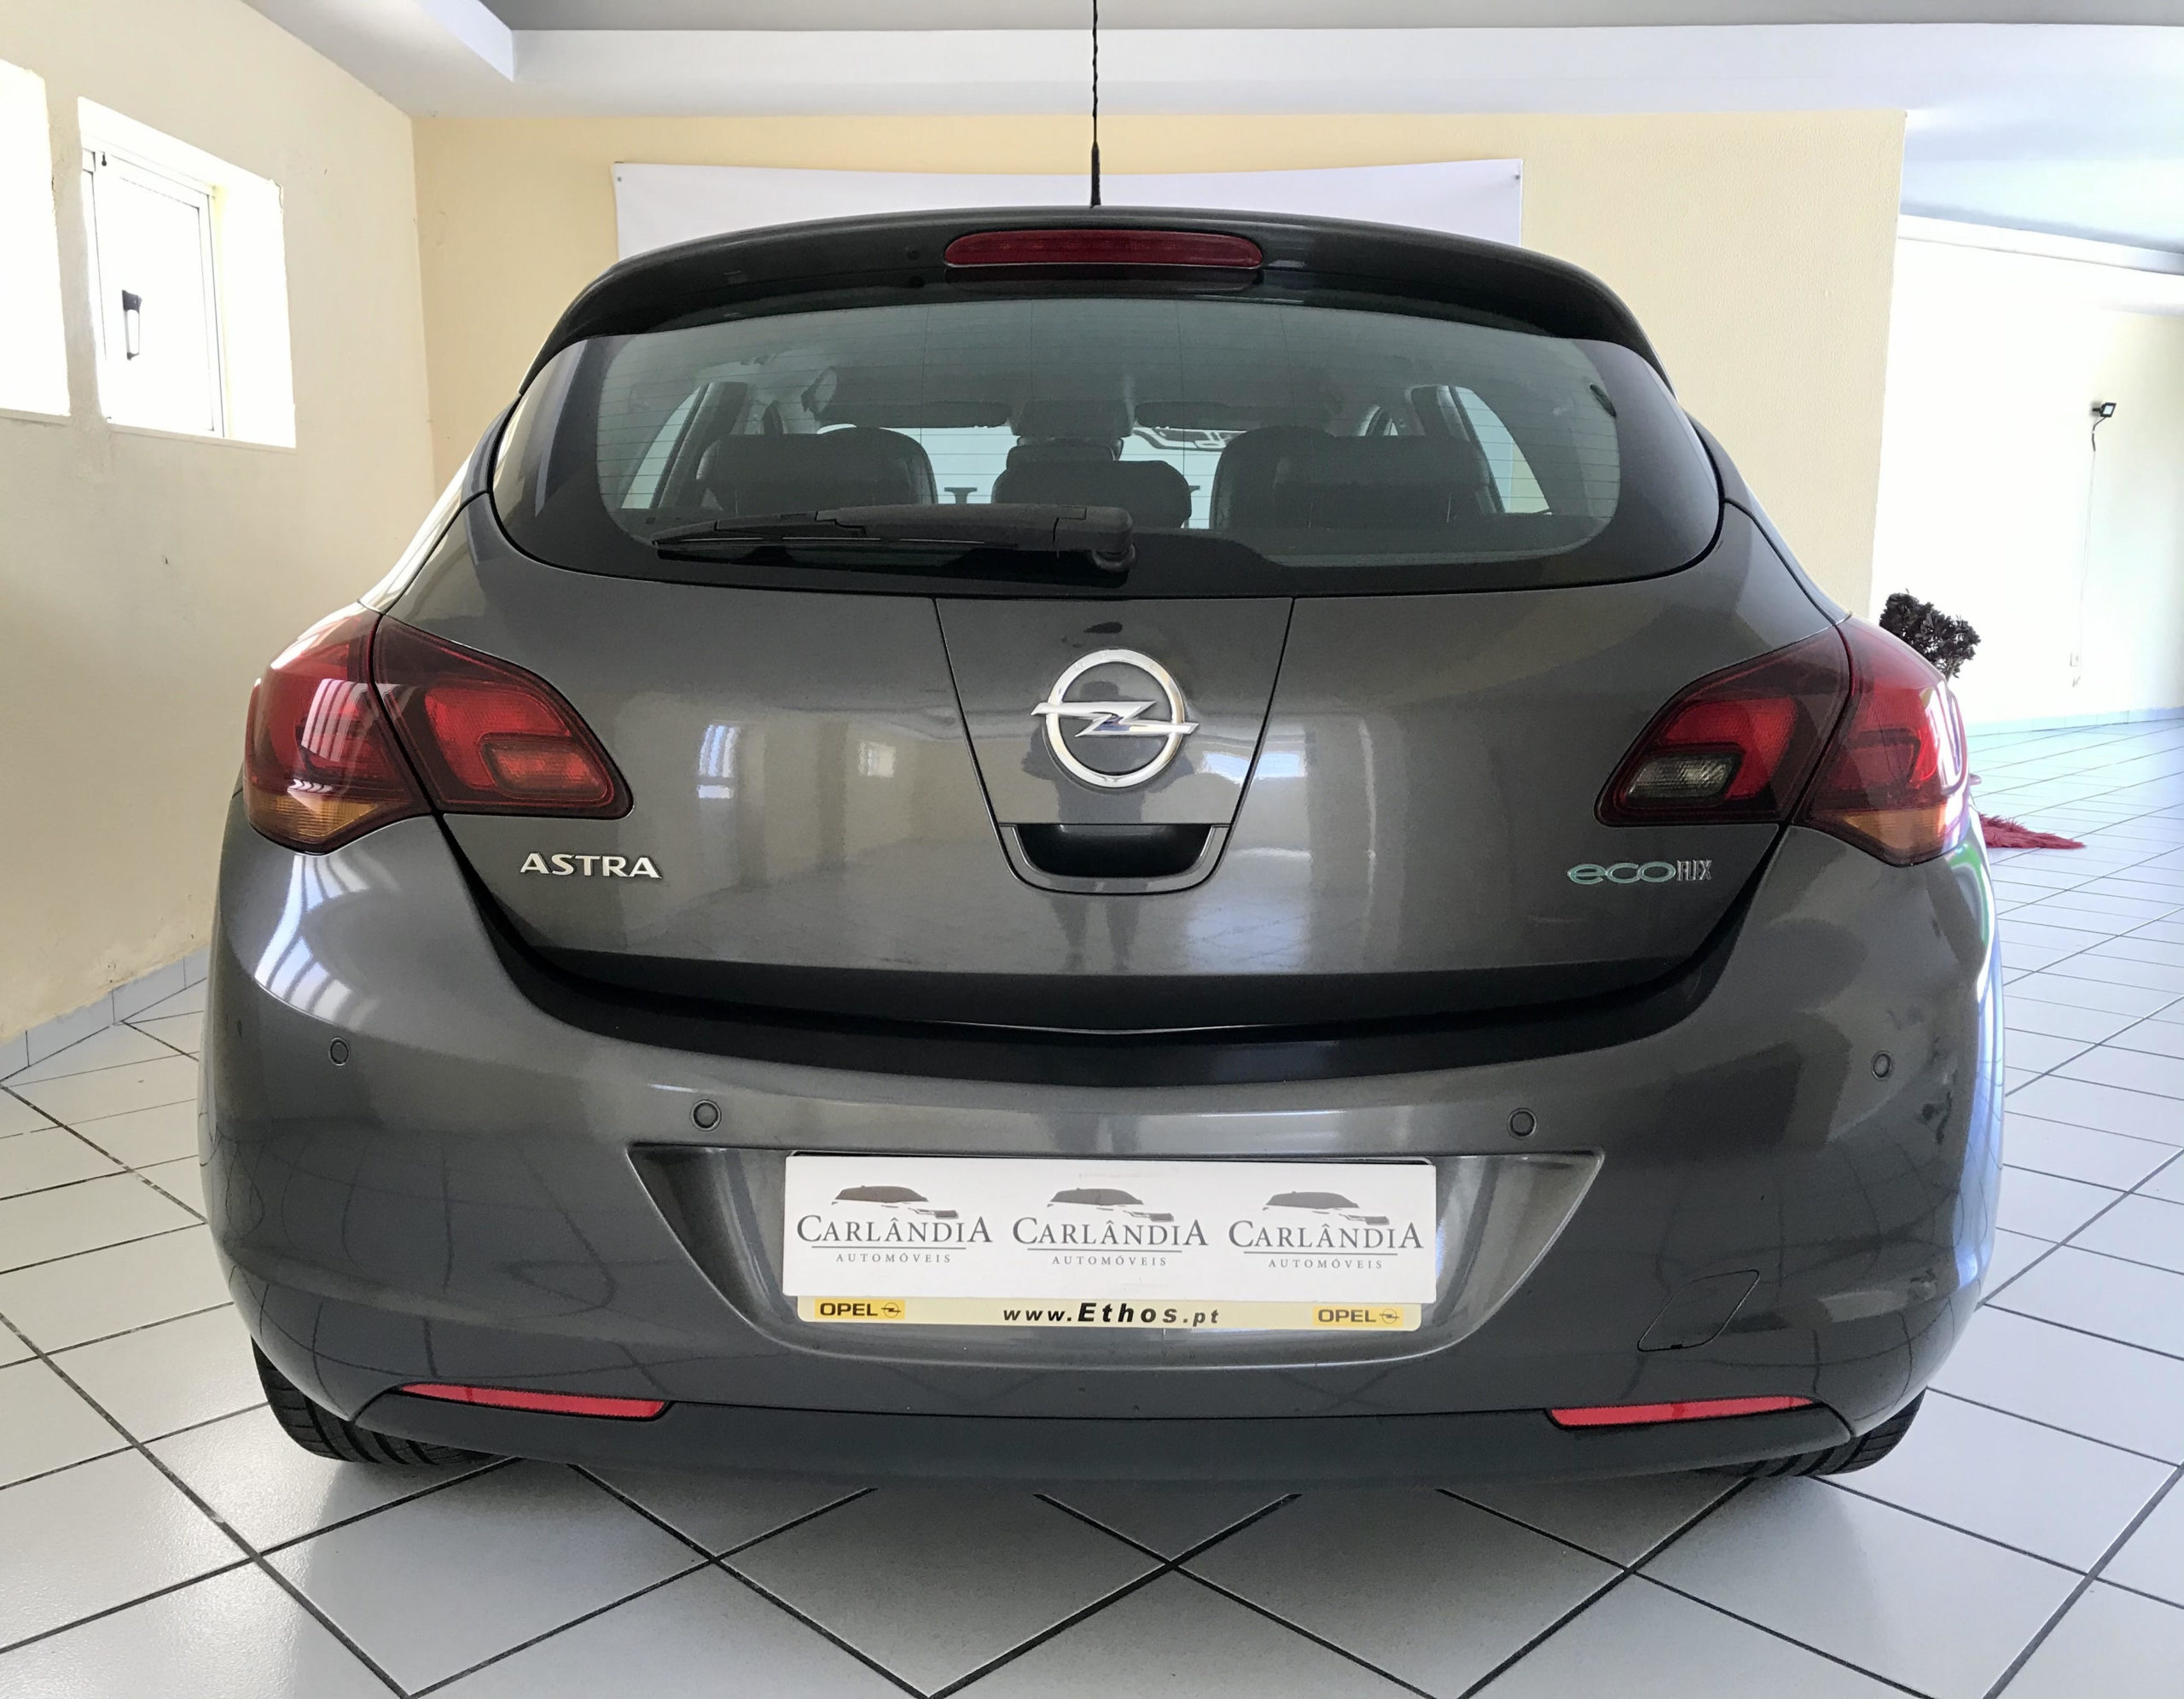 Opel Astra 1 3 Cdti Enjoy Ecoflex Carlandia Automoveis